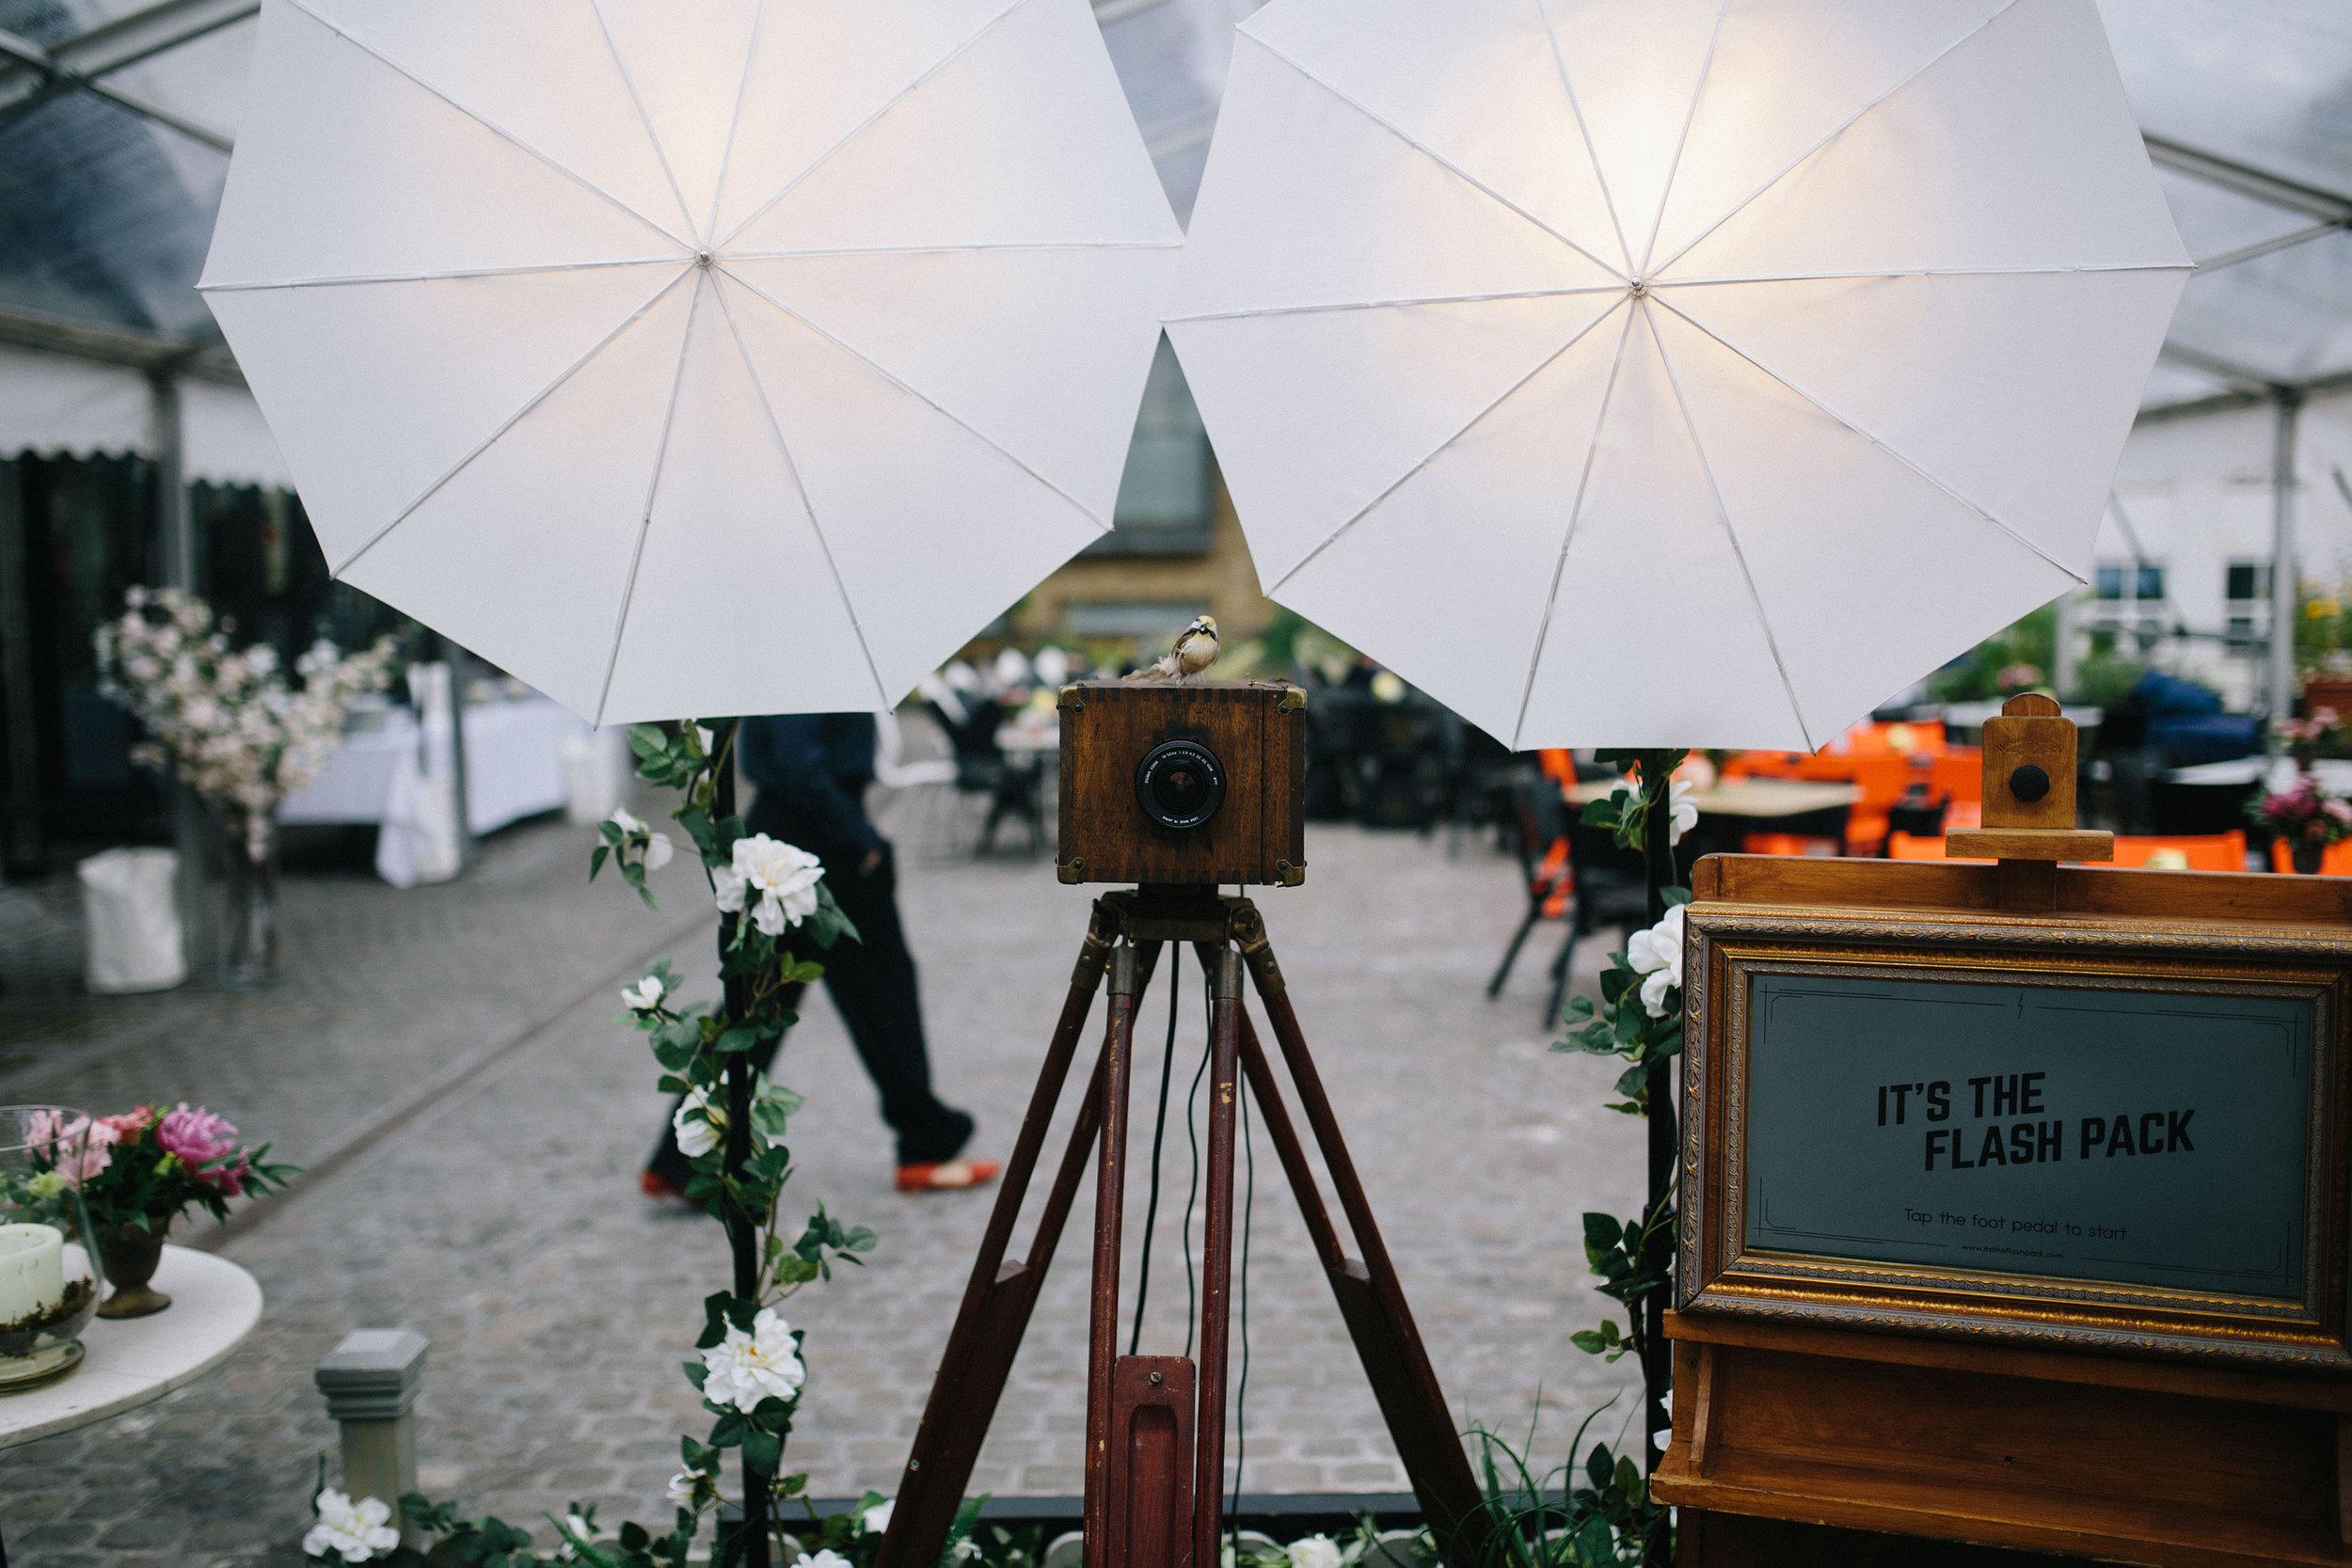 West-London-wedding-party-in-Ladbroke-Grove-Michael-Newington-Gray-9.jpg